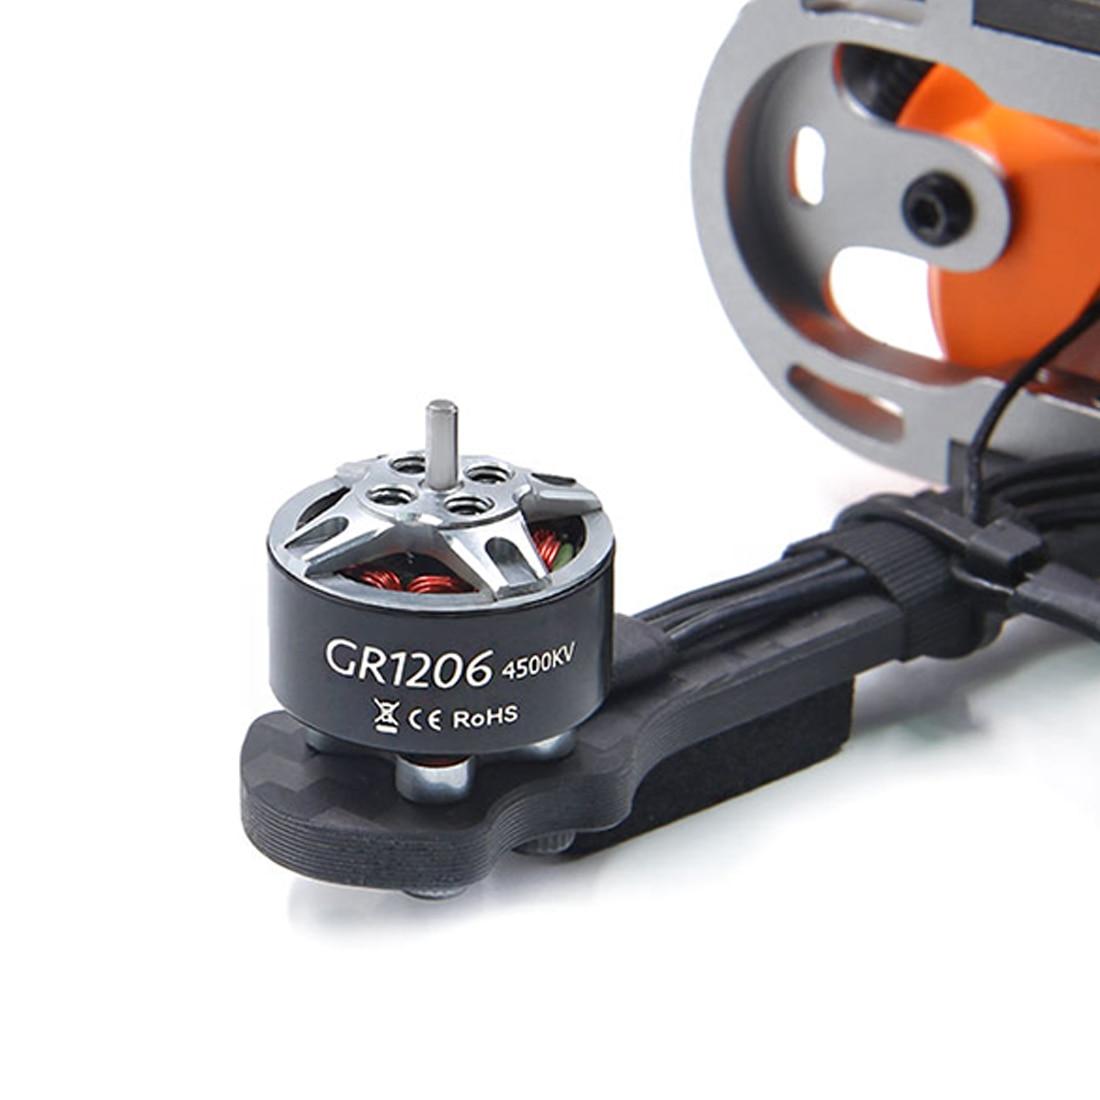 GEPRC GEP CX Cygnet 145mm 3 Inch Stable F4 20A 48CH RunCam Split Mini 2 1080P HD Camera 4500kv Motor RC FPV Racing Drone BNF PNP - 2